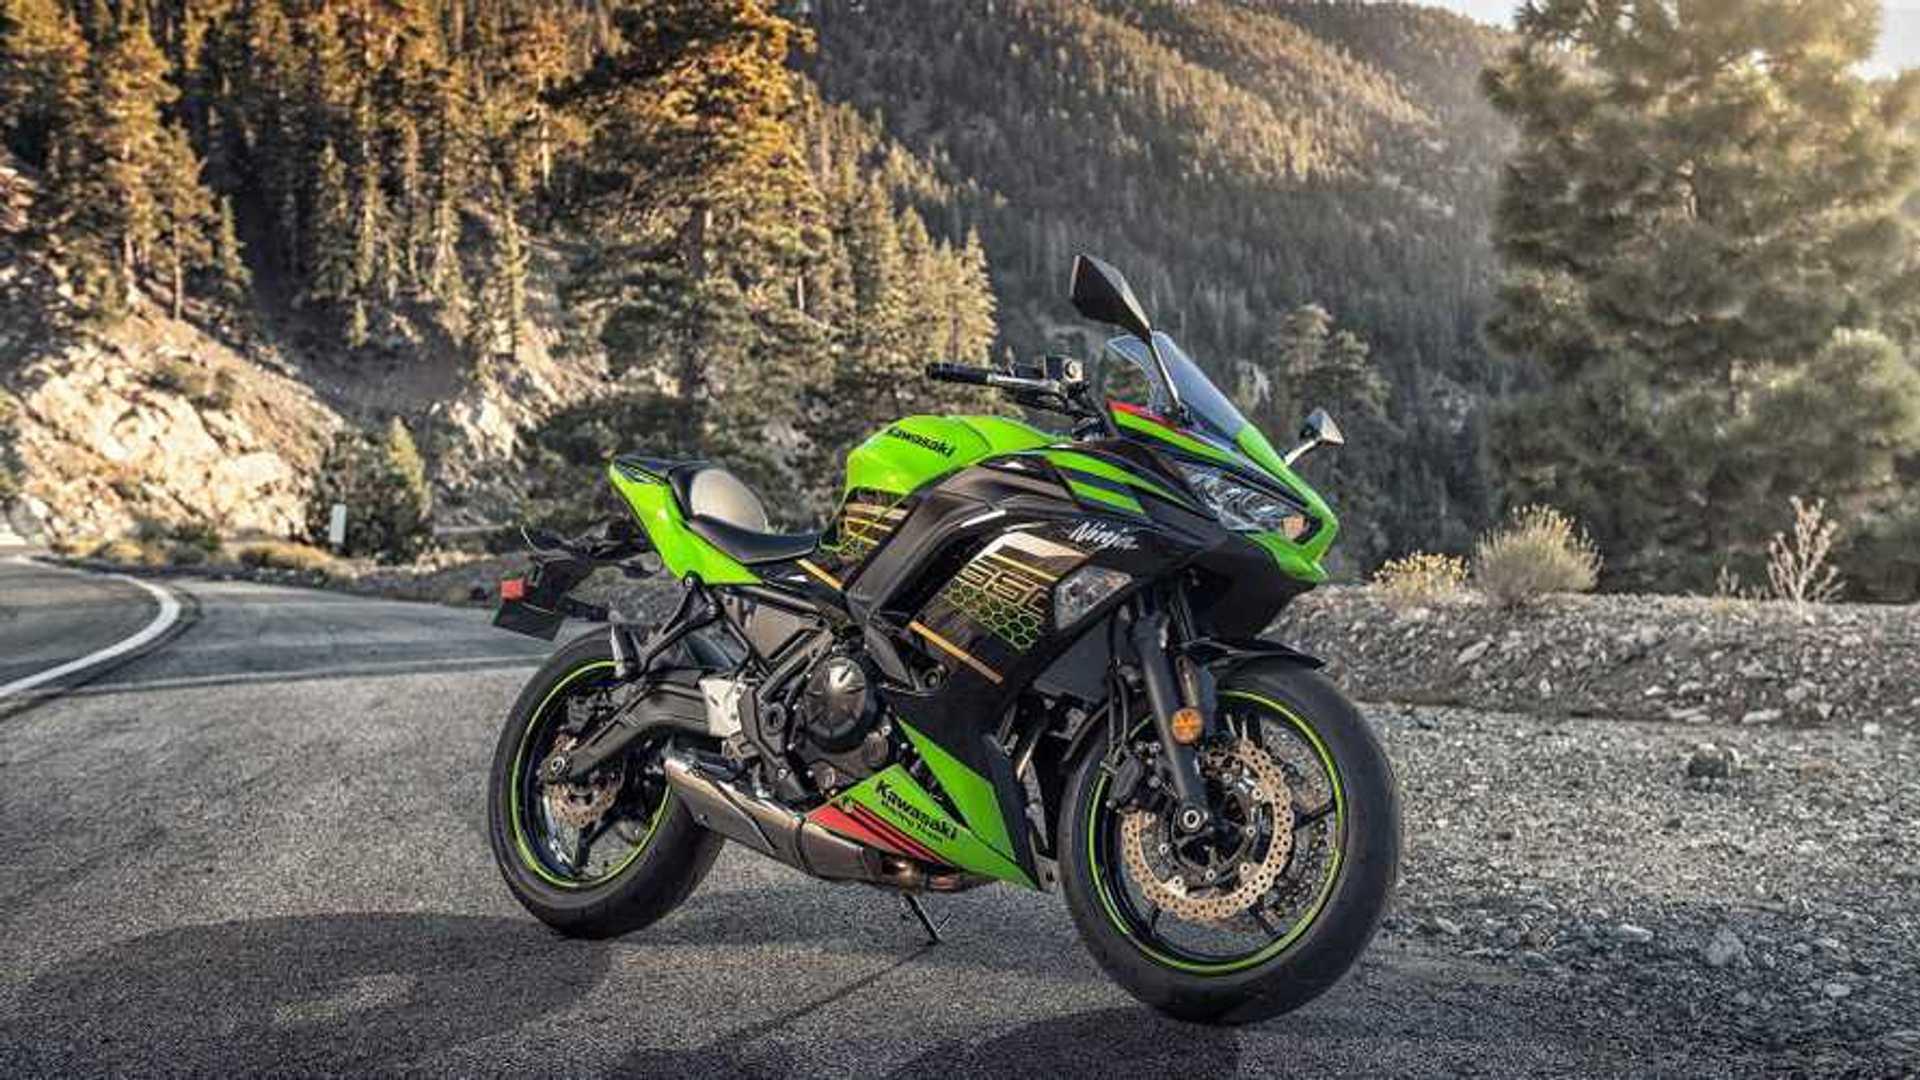 New 2020 Kawasaki Ninja 650